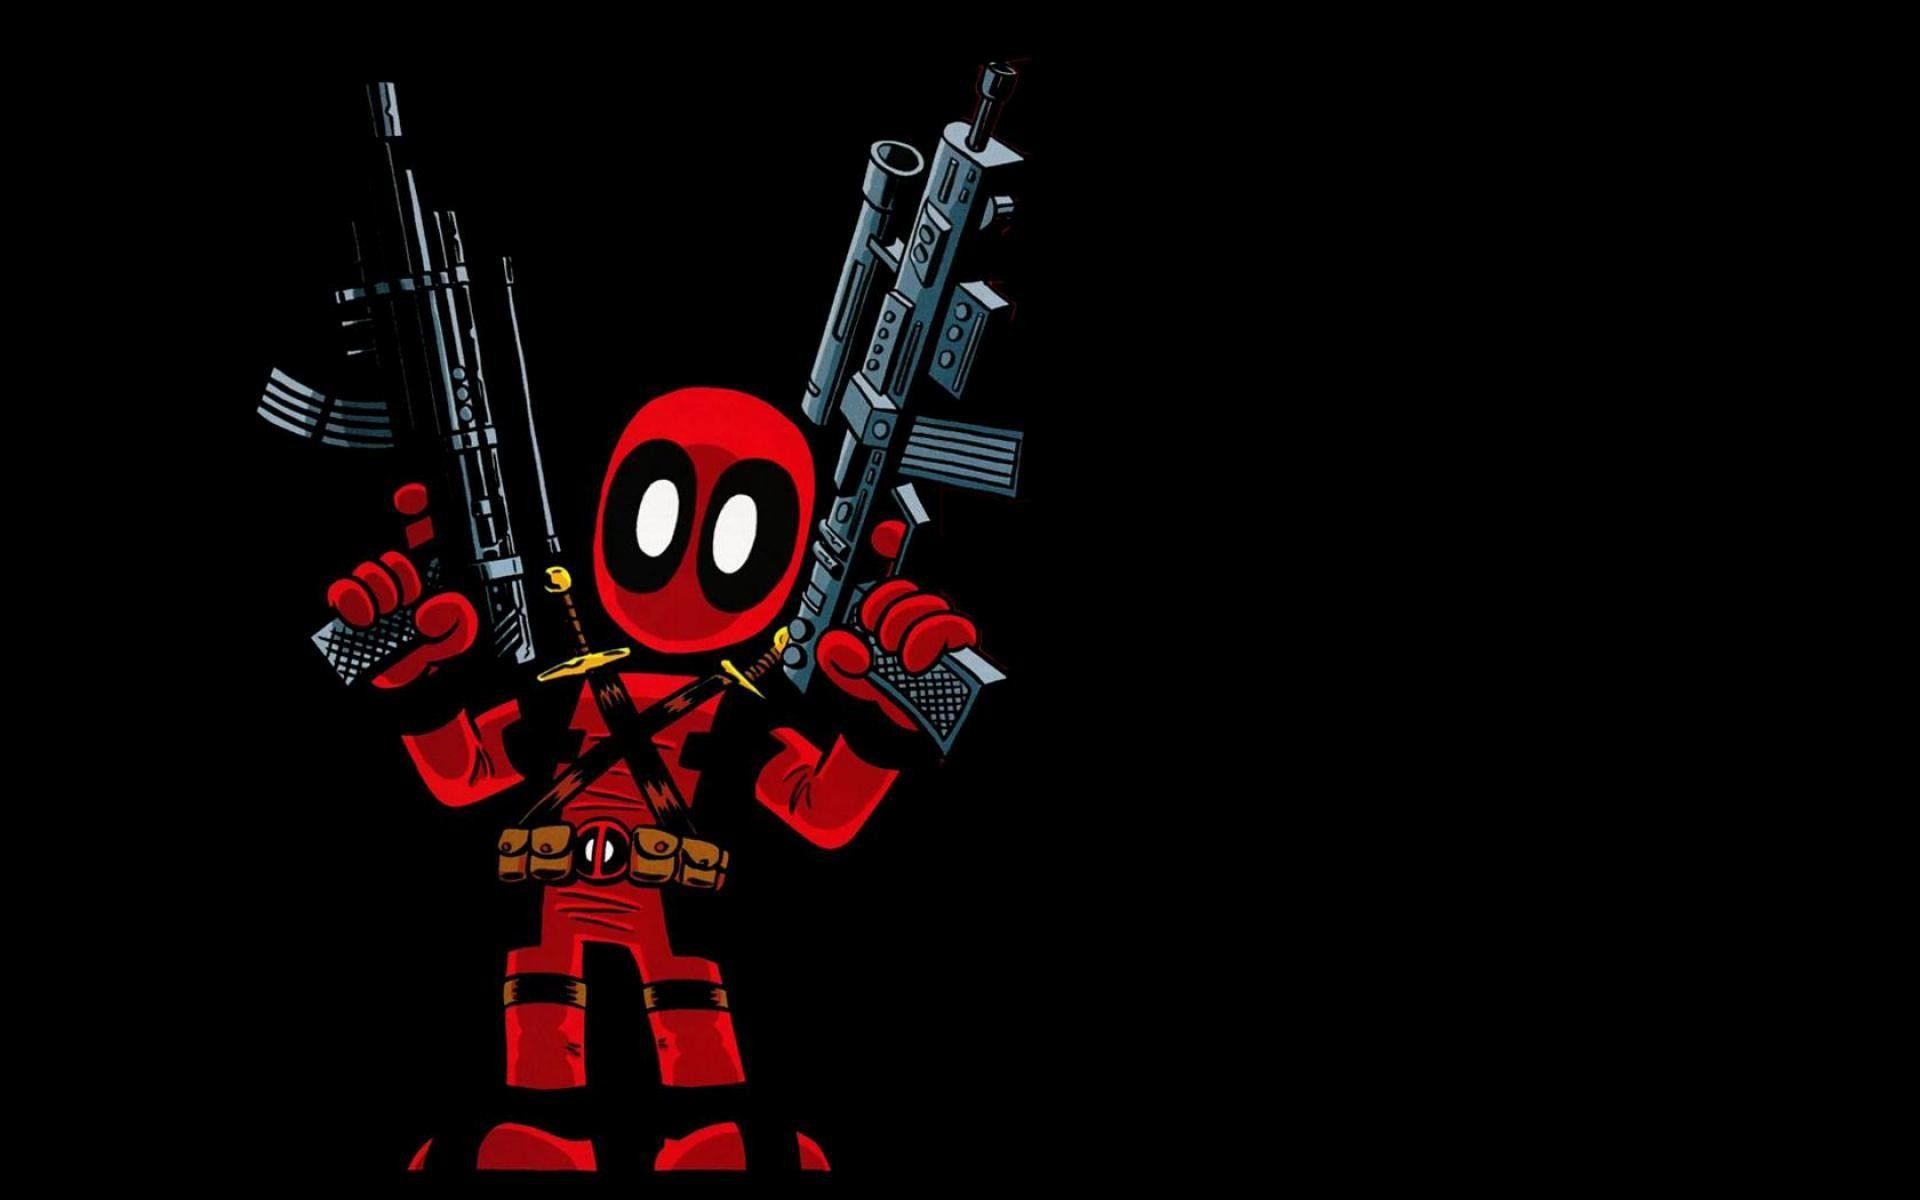 Cool Deadpool Wallpaper 74 Images